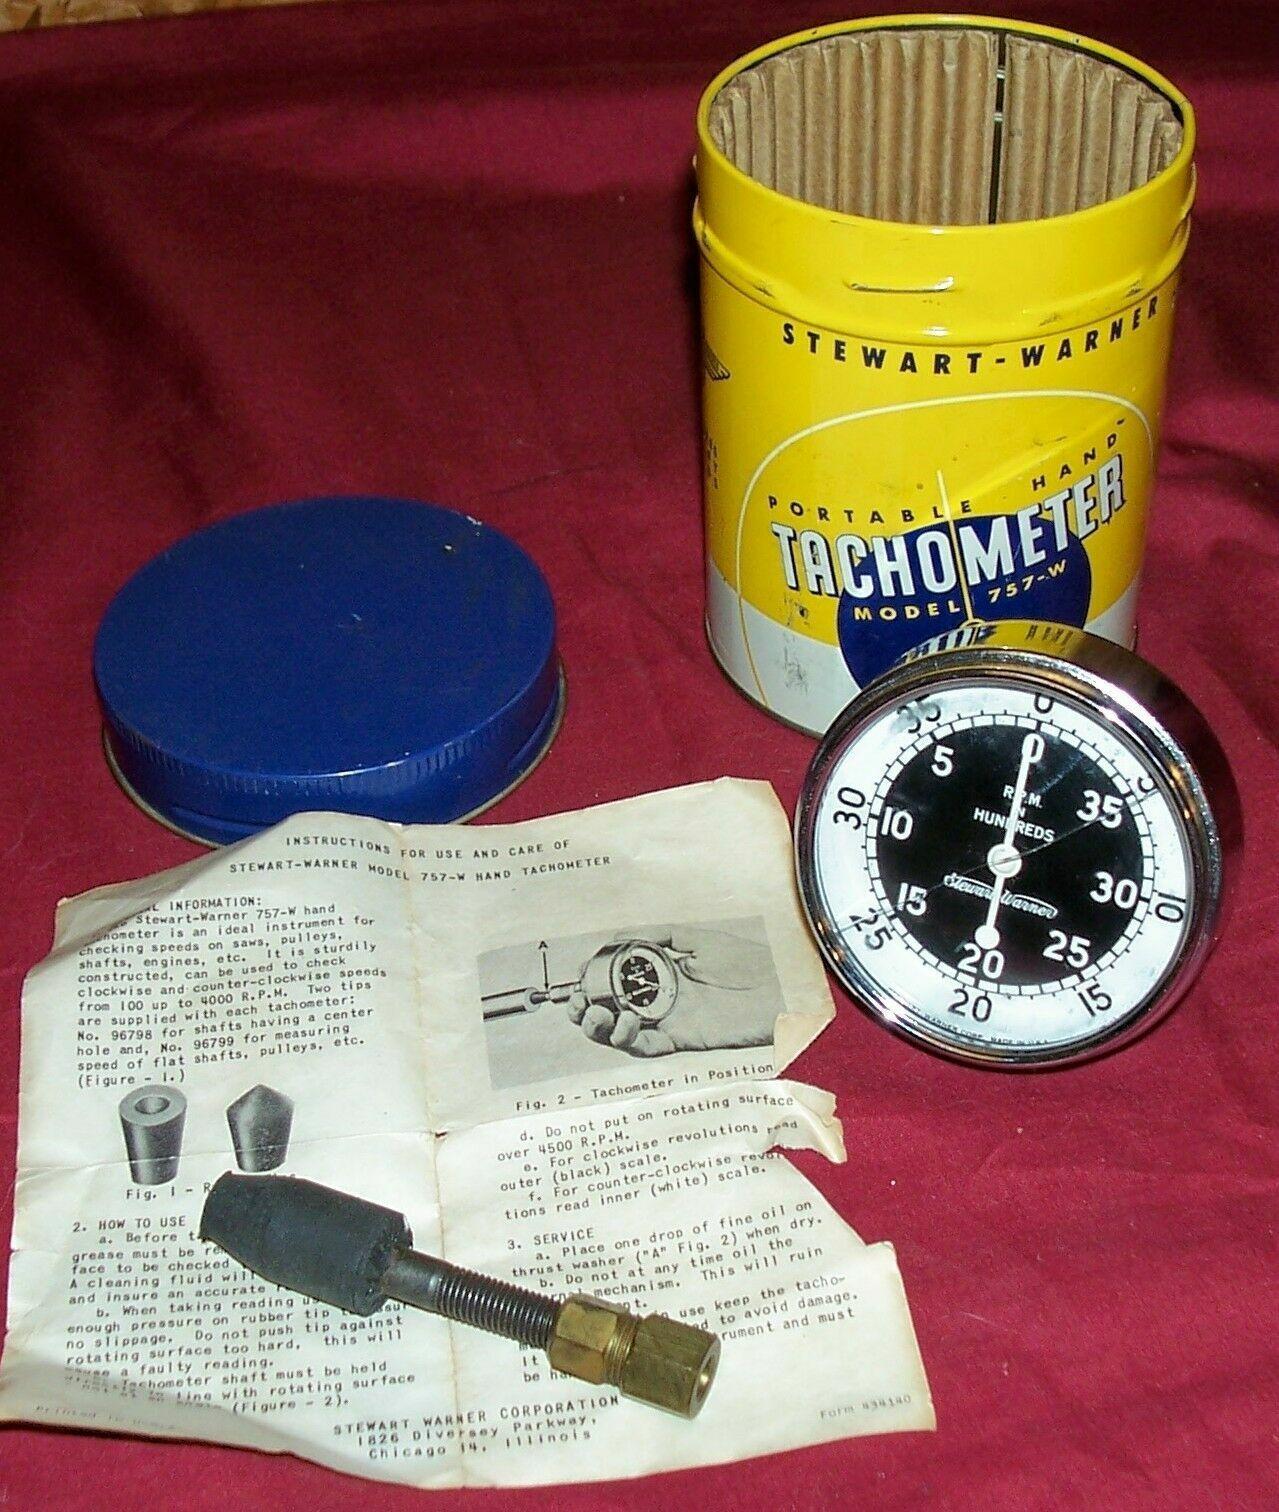 Stewart Warner Portable Hand Tachometer Model 757 W